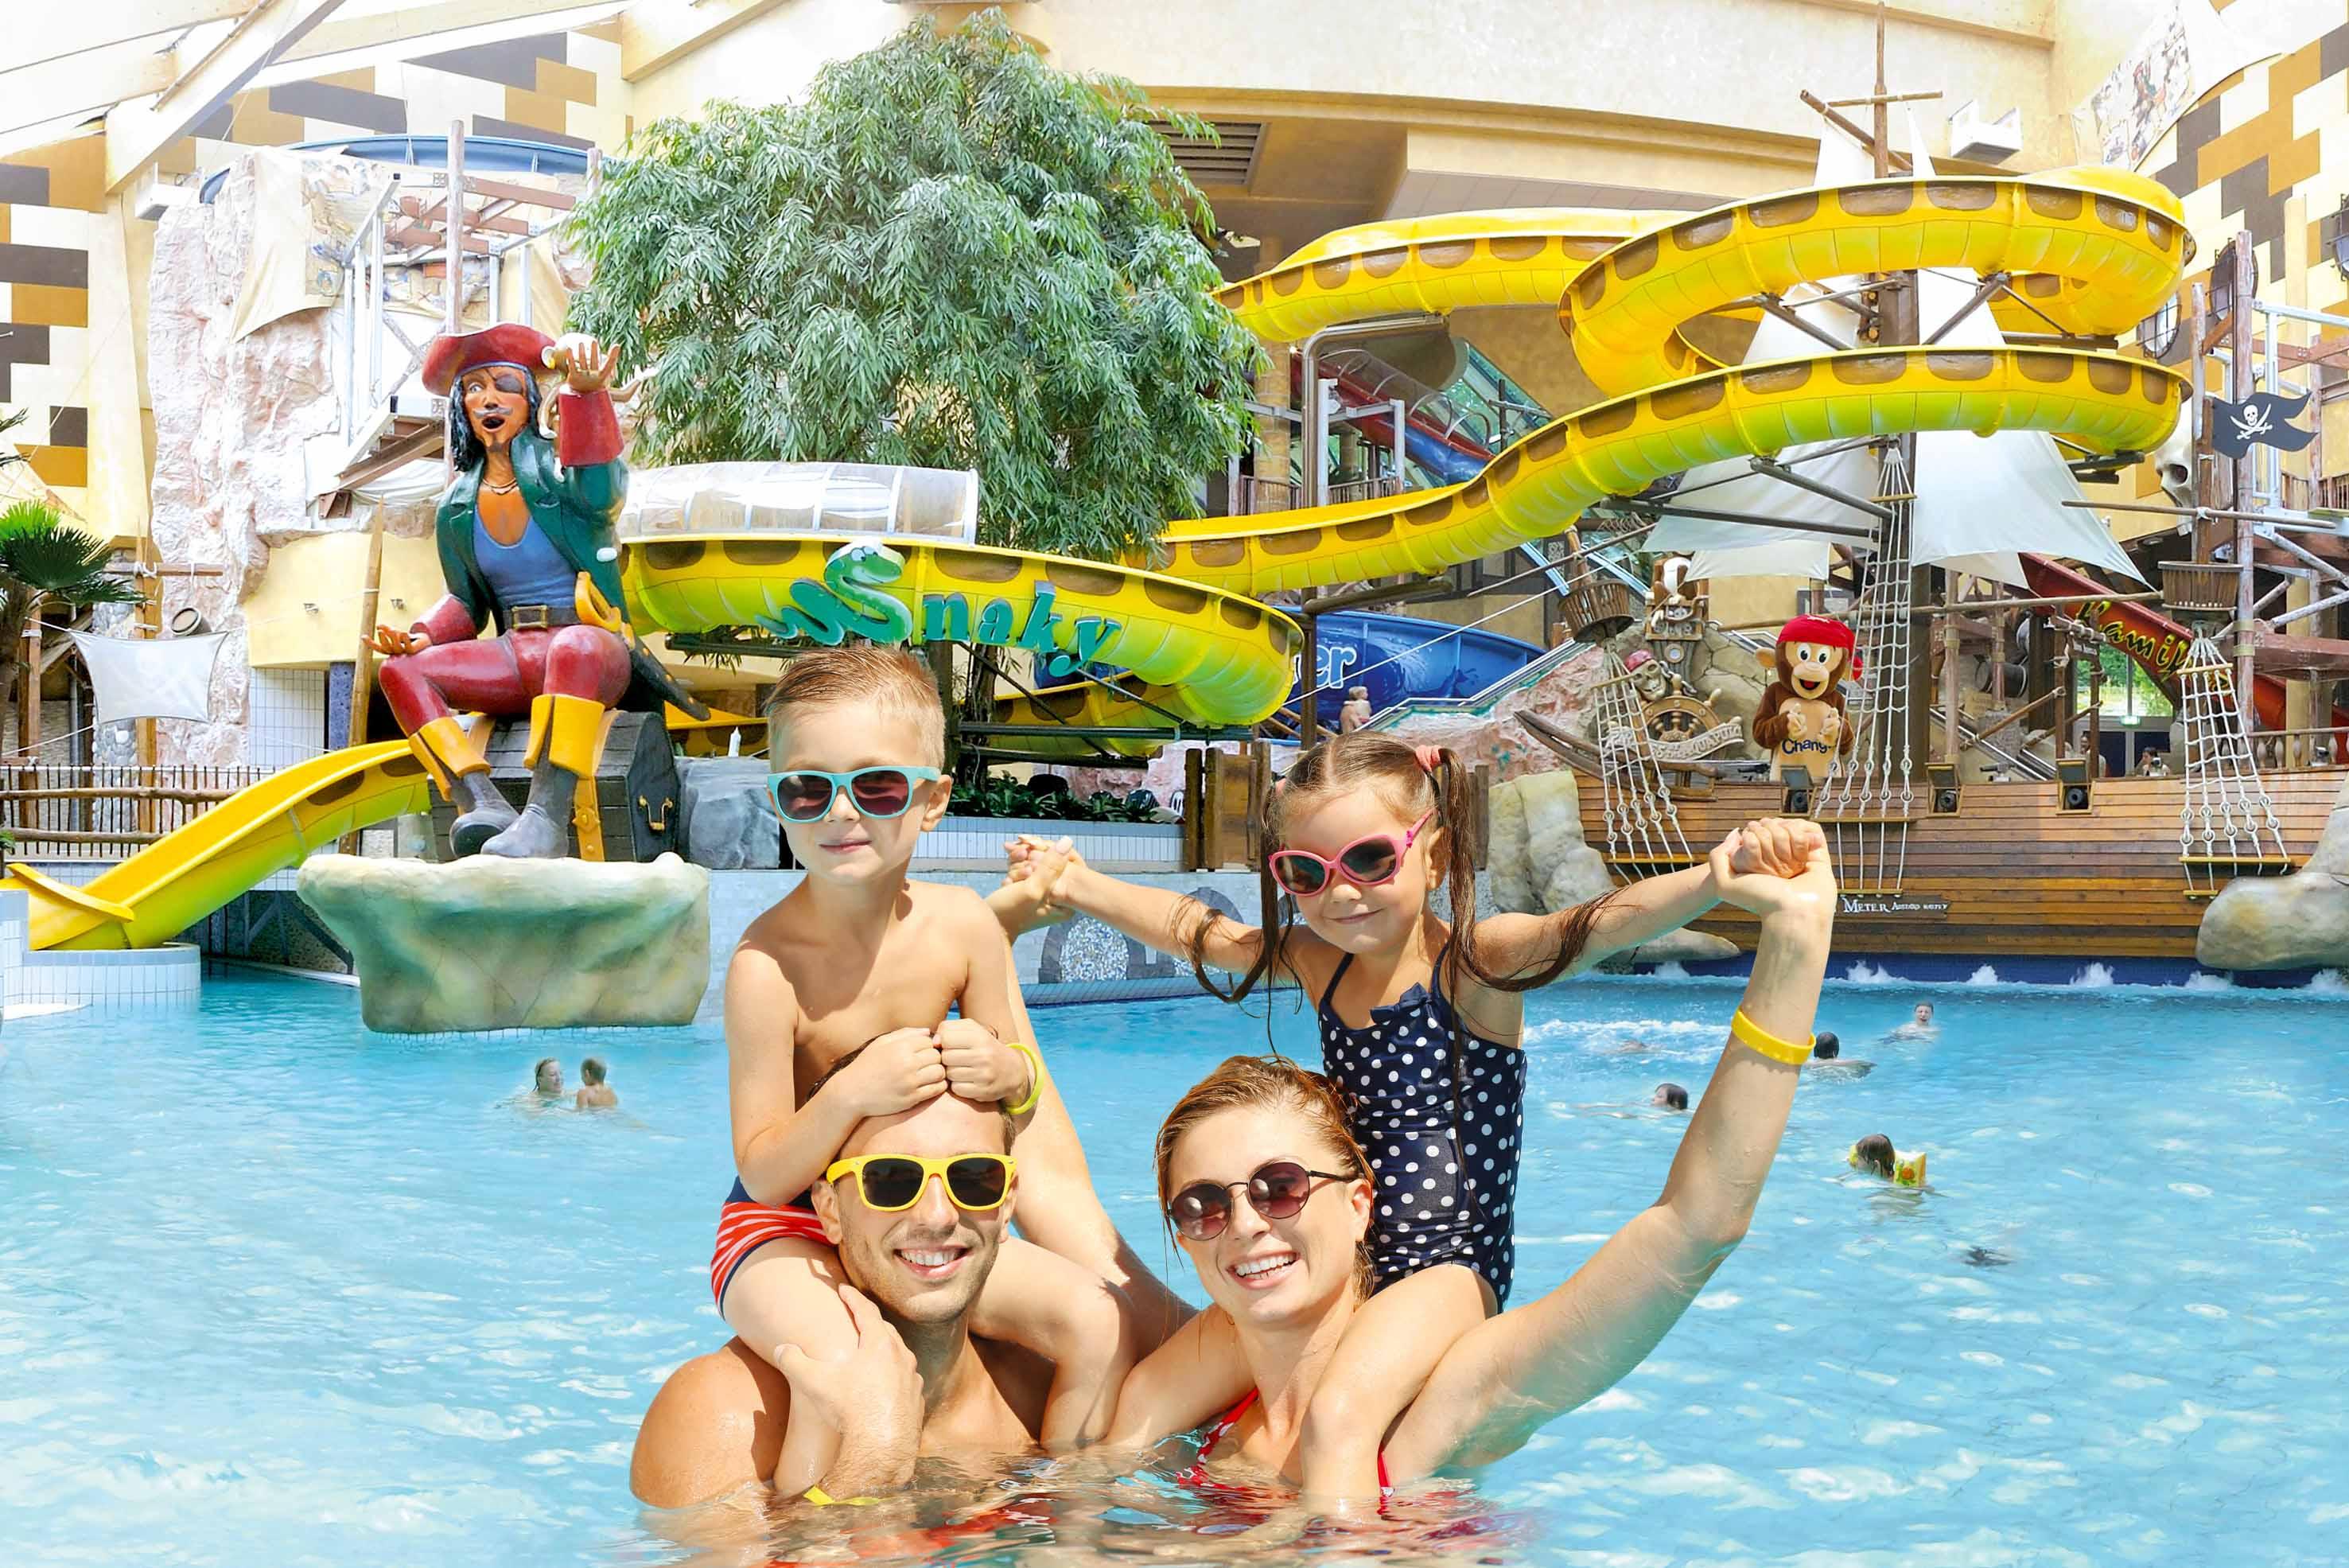 Familienhotel Paradiso in Bad Schallerbach: Erlebnisbad & Spa